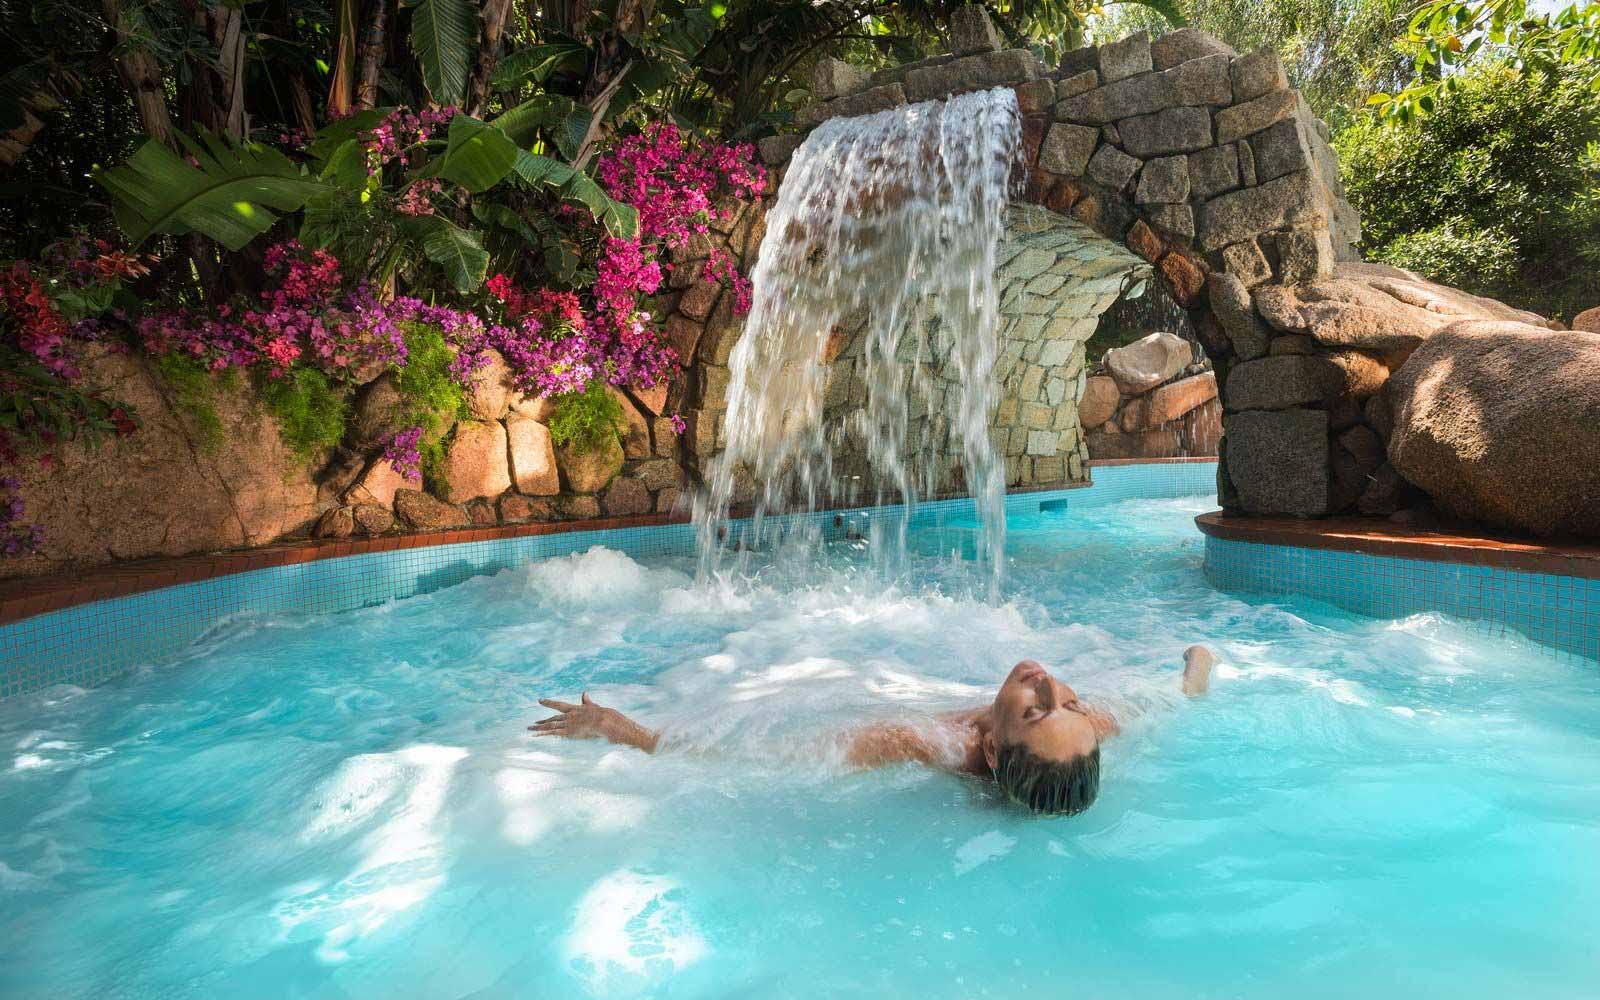 Acquaforte spa at the Forte Village Resort